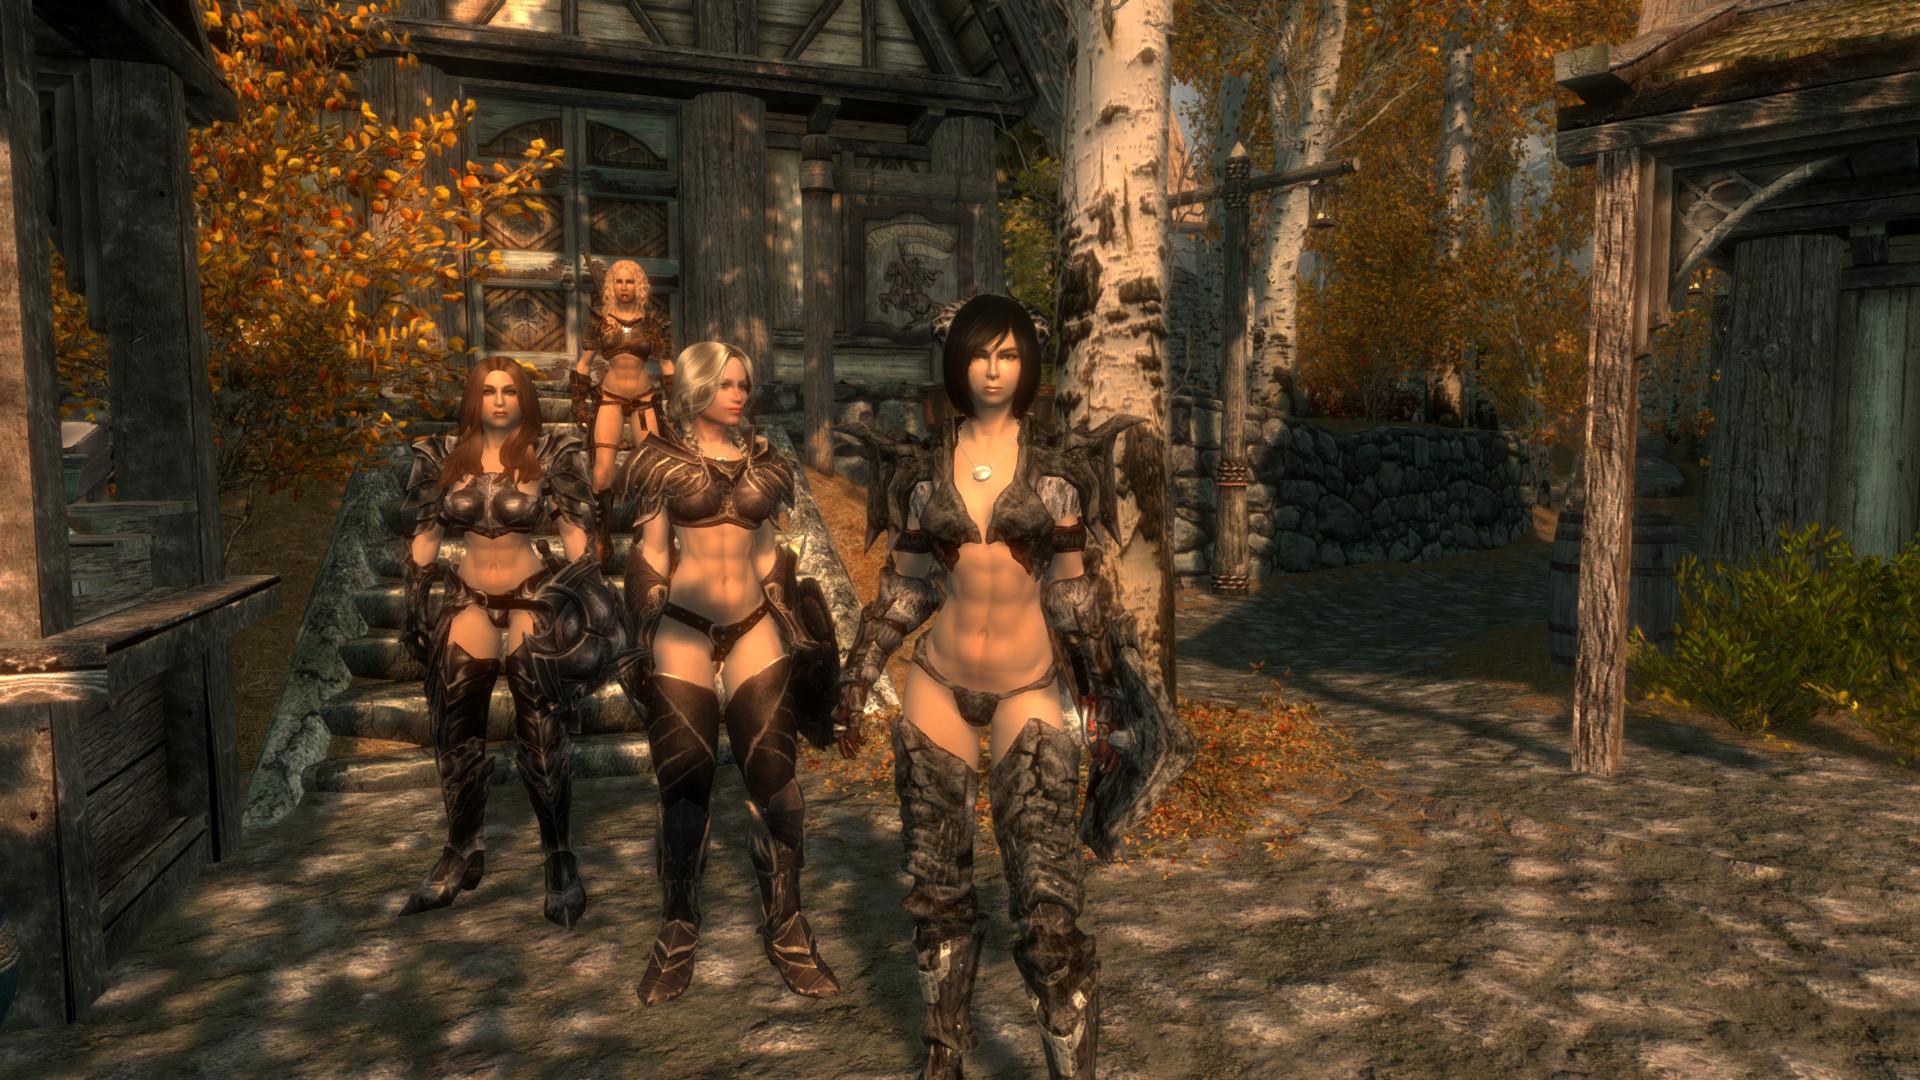 Free download Sexy Vanilla Female Armor for UNP and